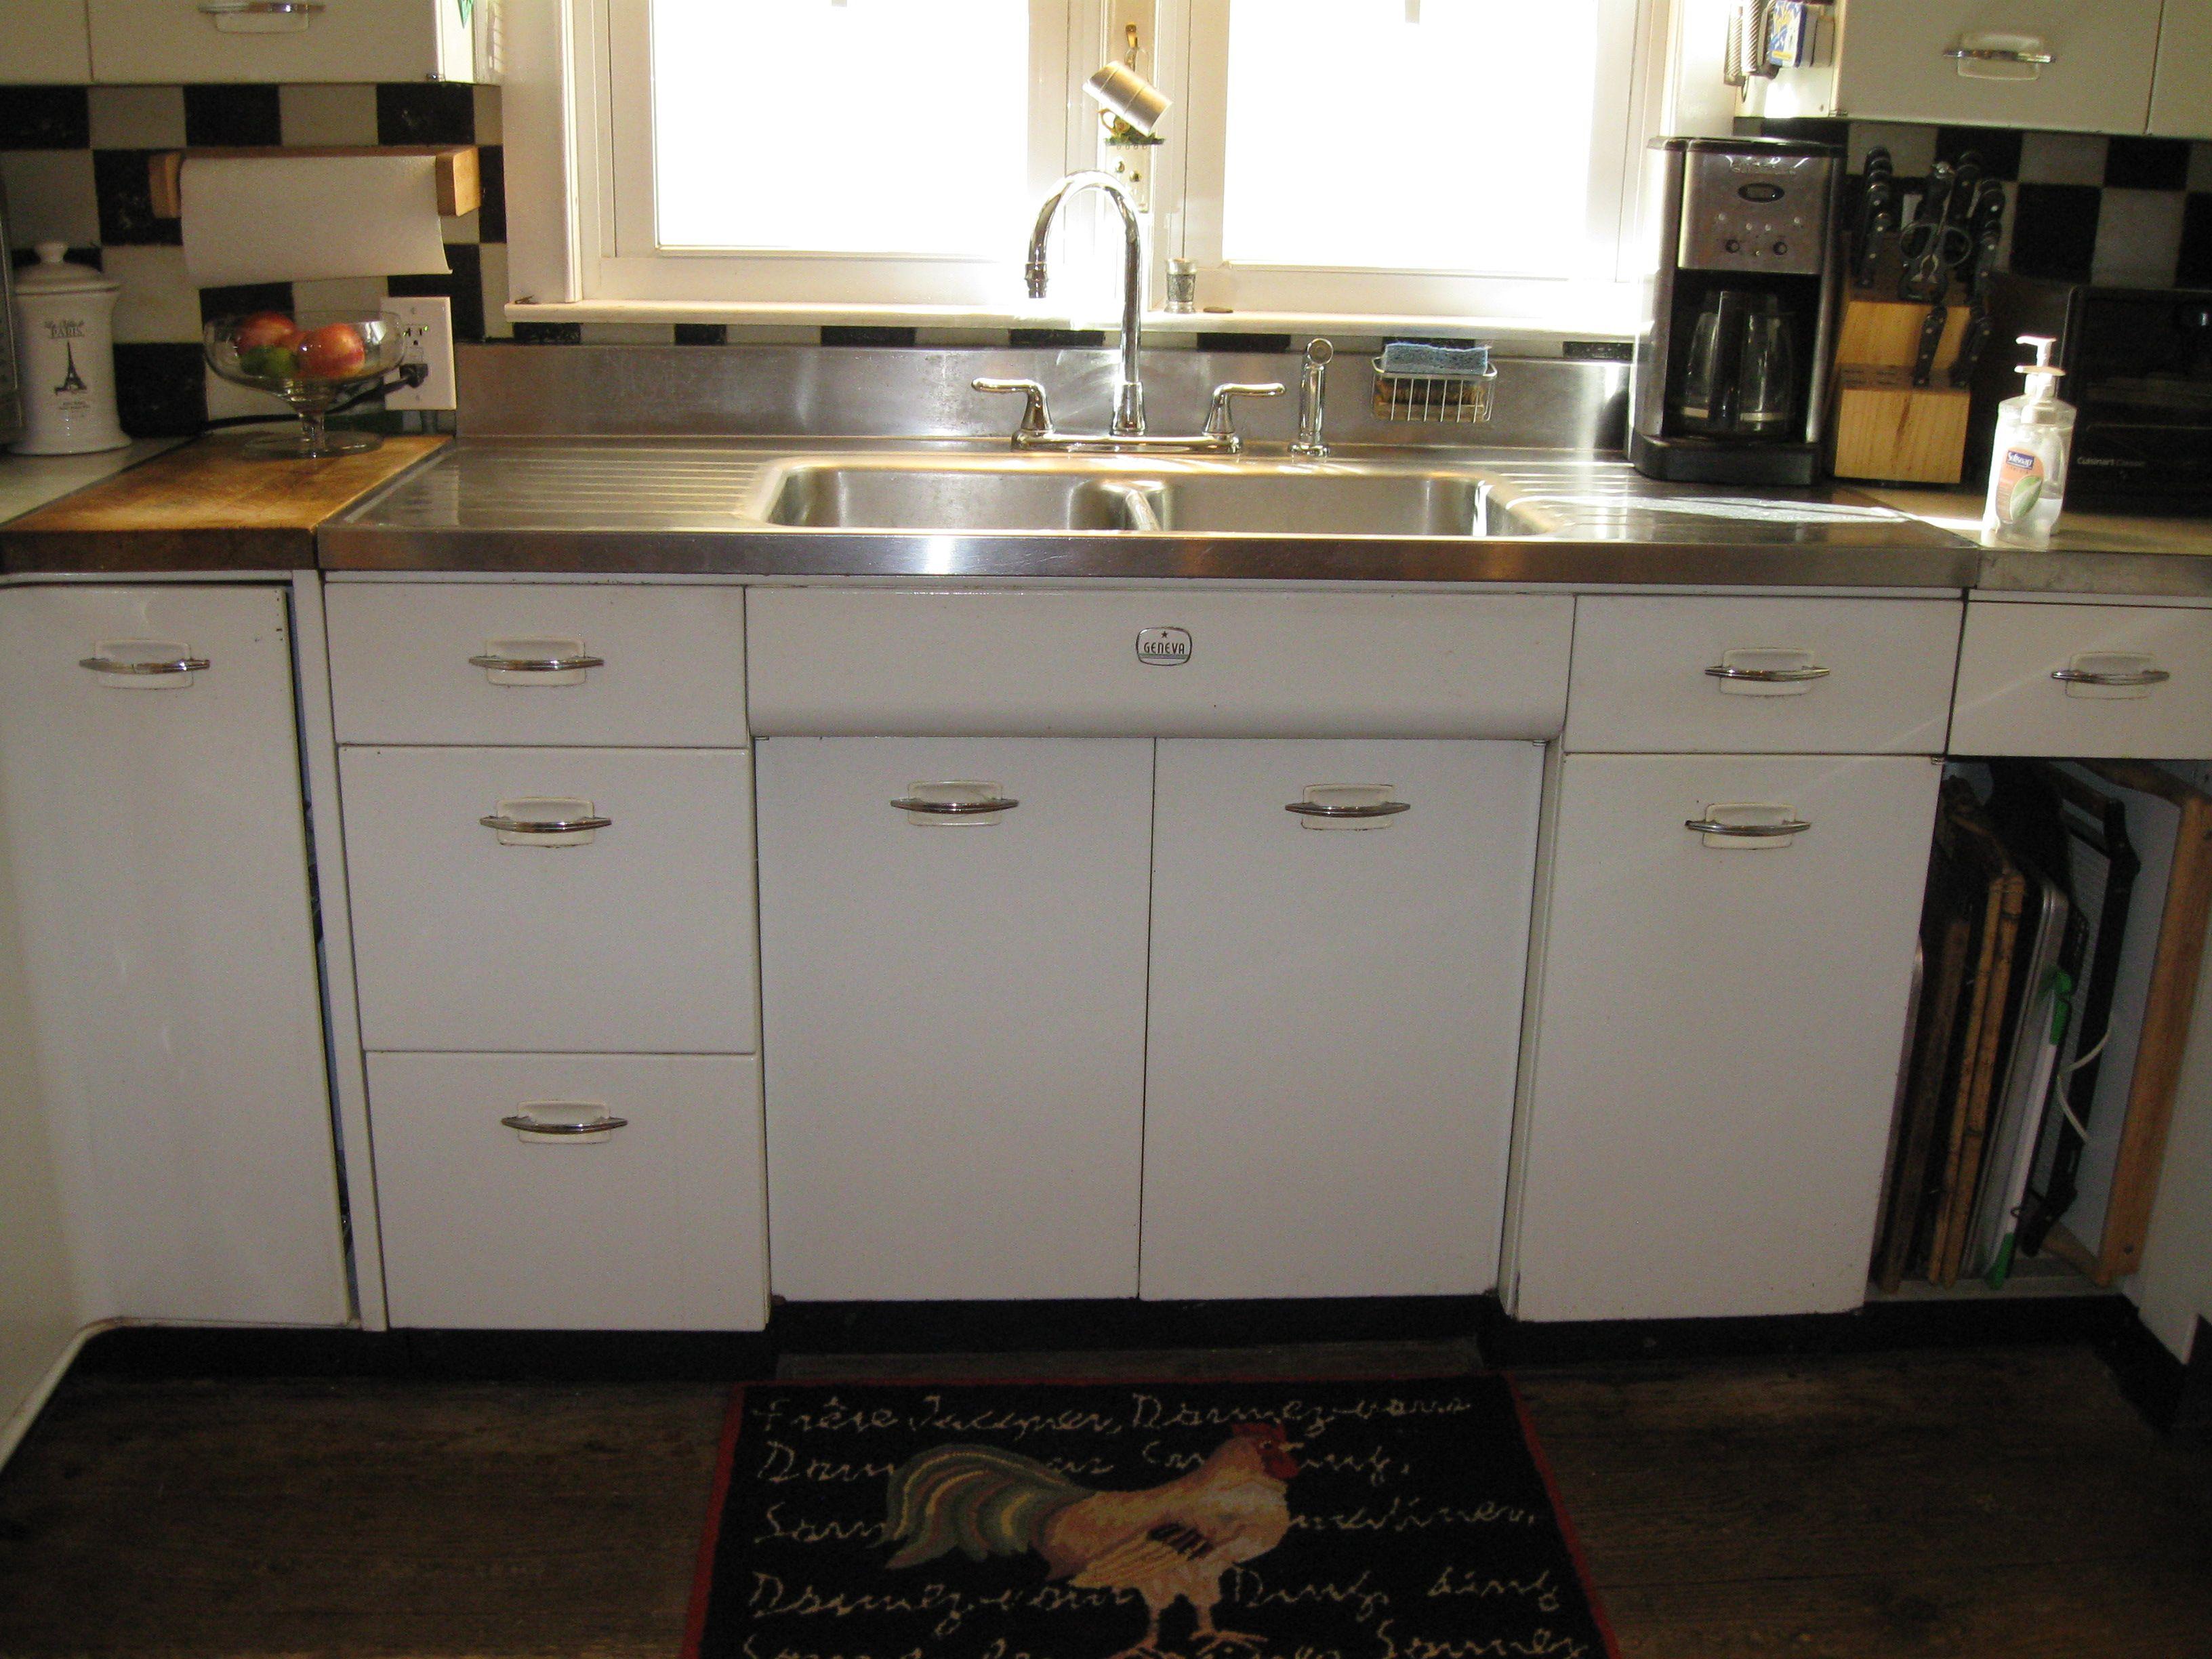 Geneva Cabinets Complete Set For Sale $1200  Or Best Offer. 10 Cabinets  Total.